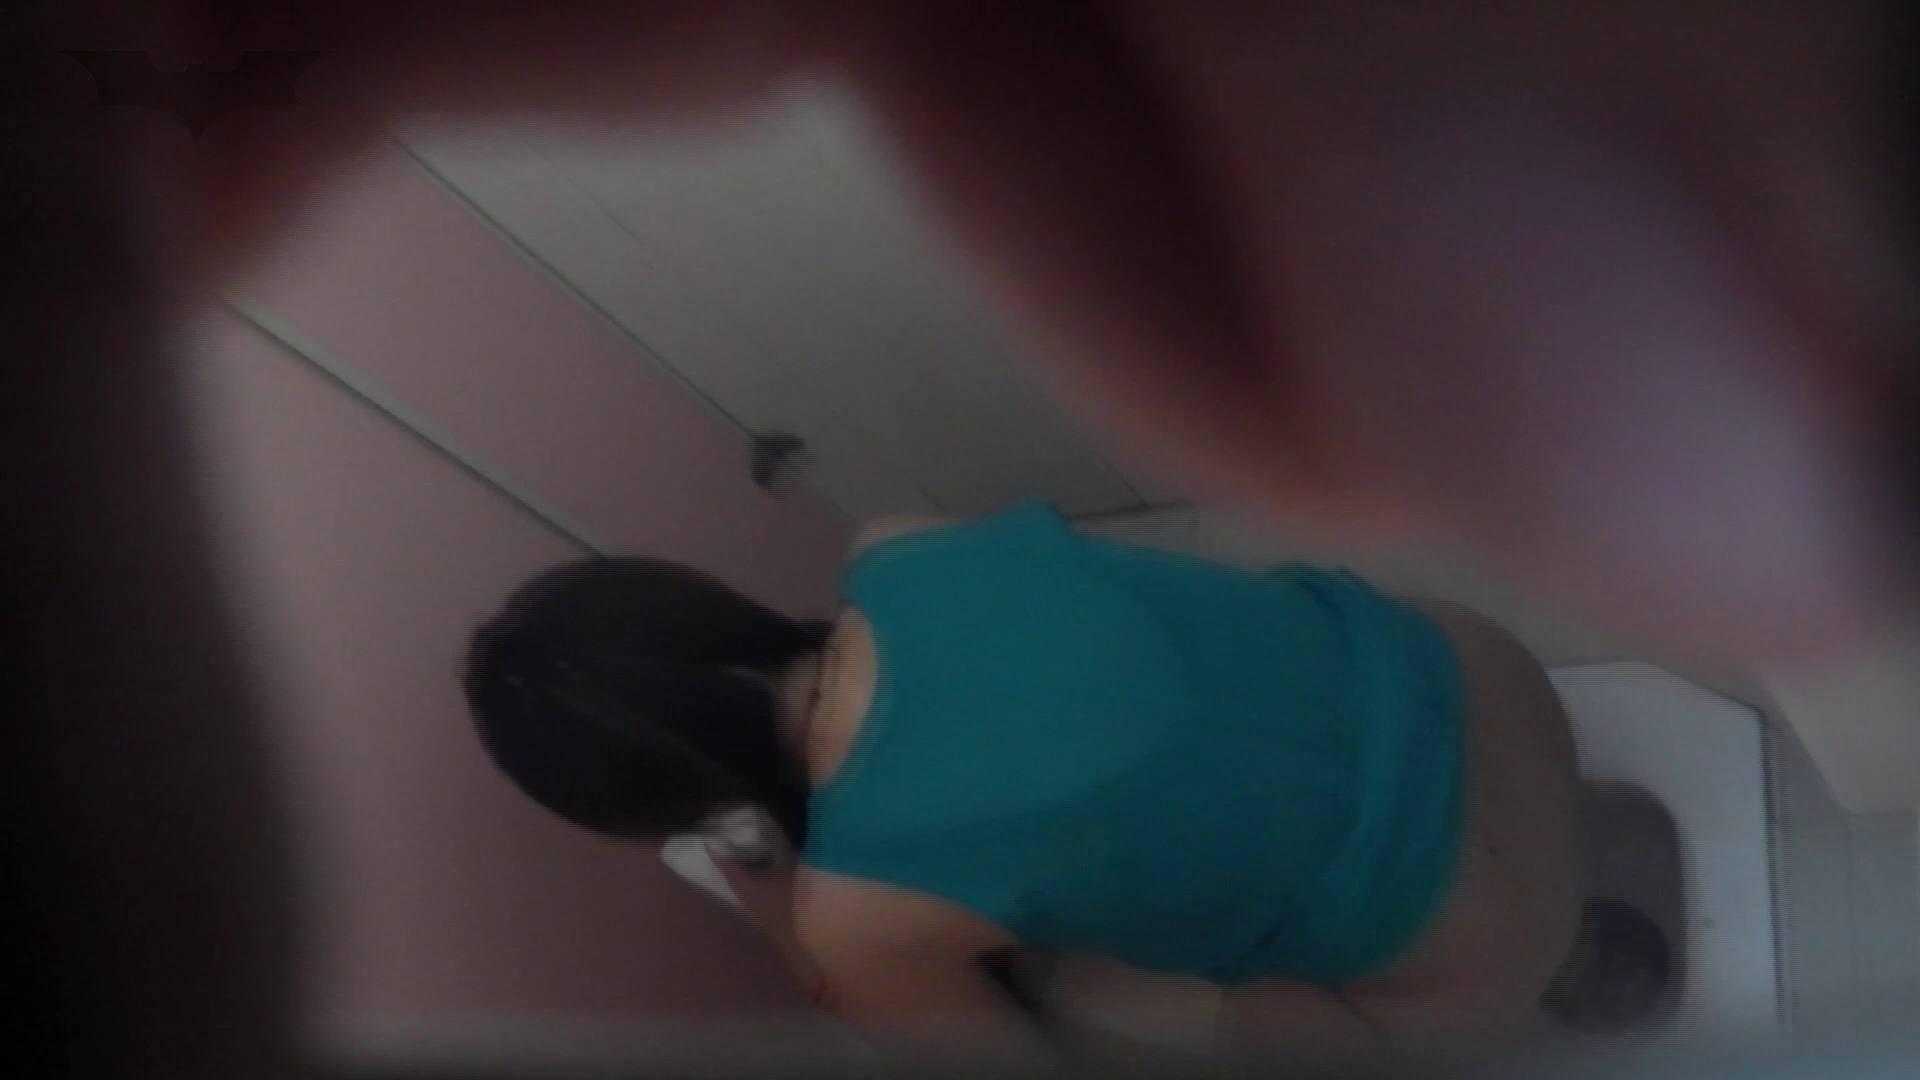 潜入!!台湾名門女学院 Vol.02 必見!中腰で「大」途中筋力の限界に・・・。 潜入 エロ画像 103枚 68